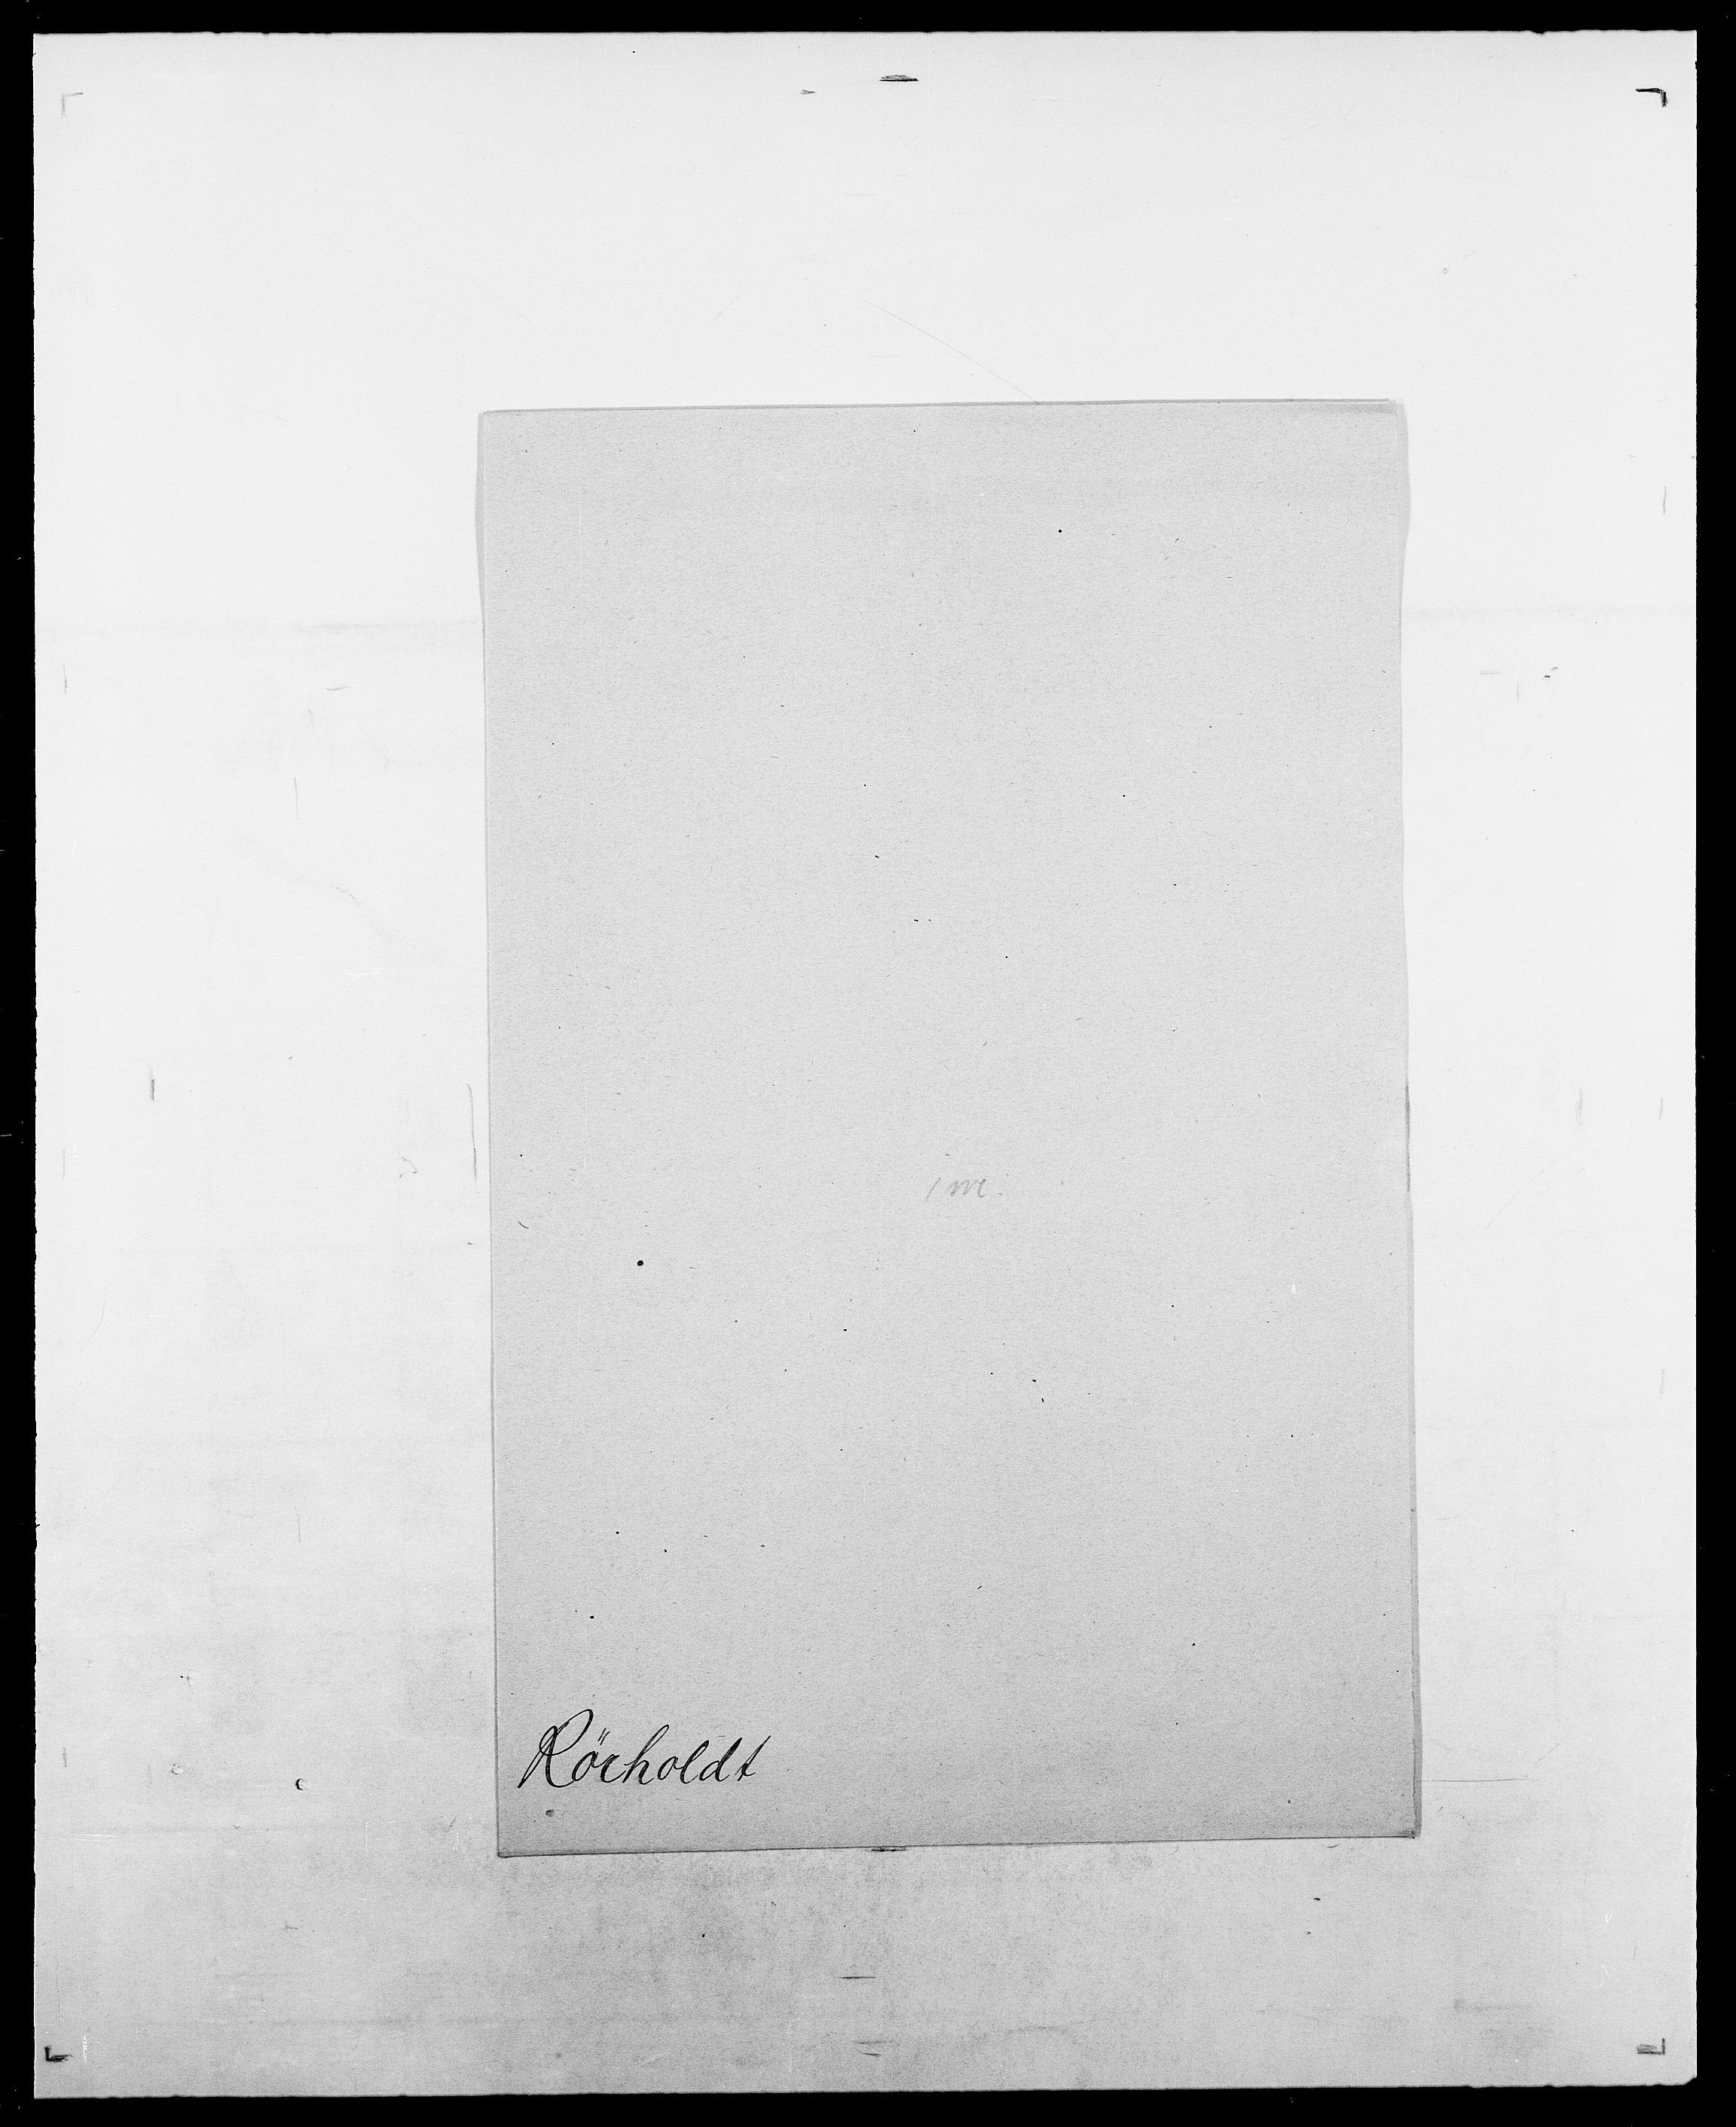 SAO, Delgobe, Charles Antoine - samling, D/Da/L0033: Roald - Røyem, s. 805